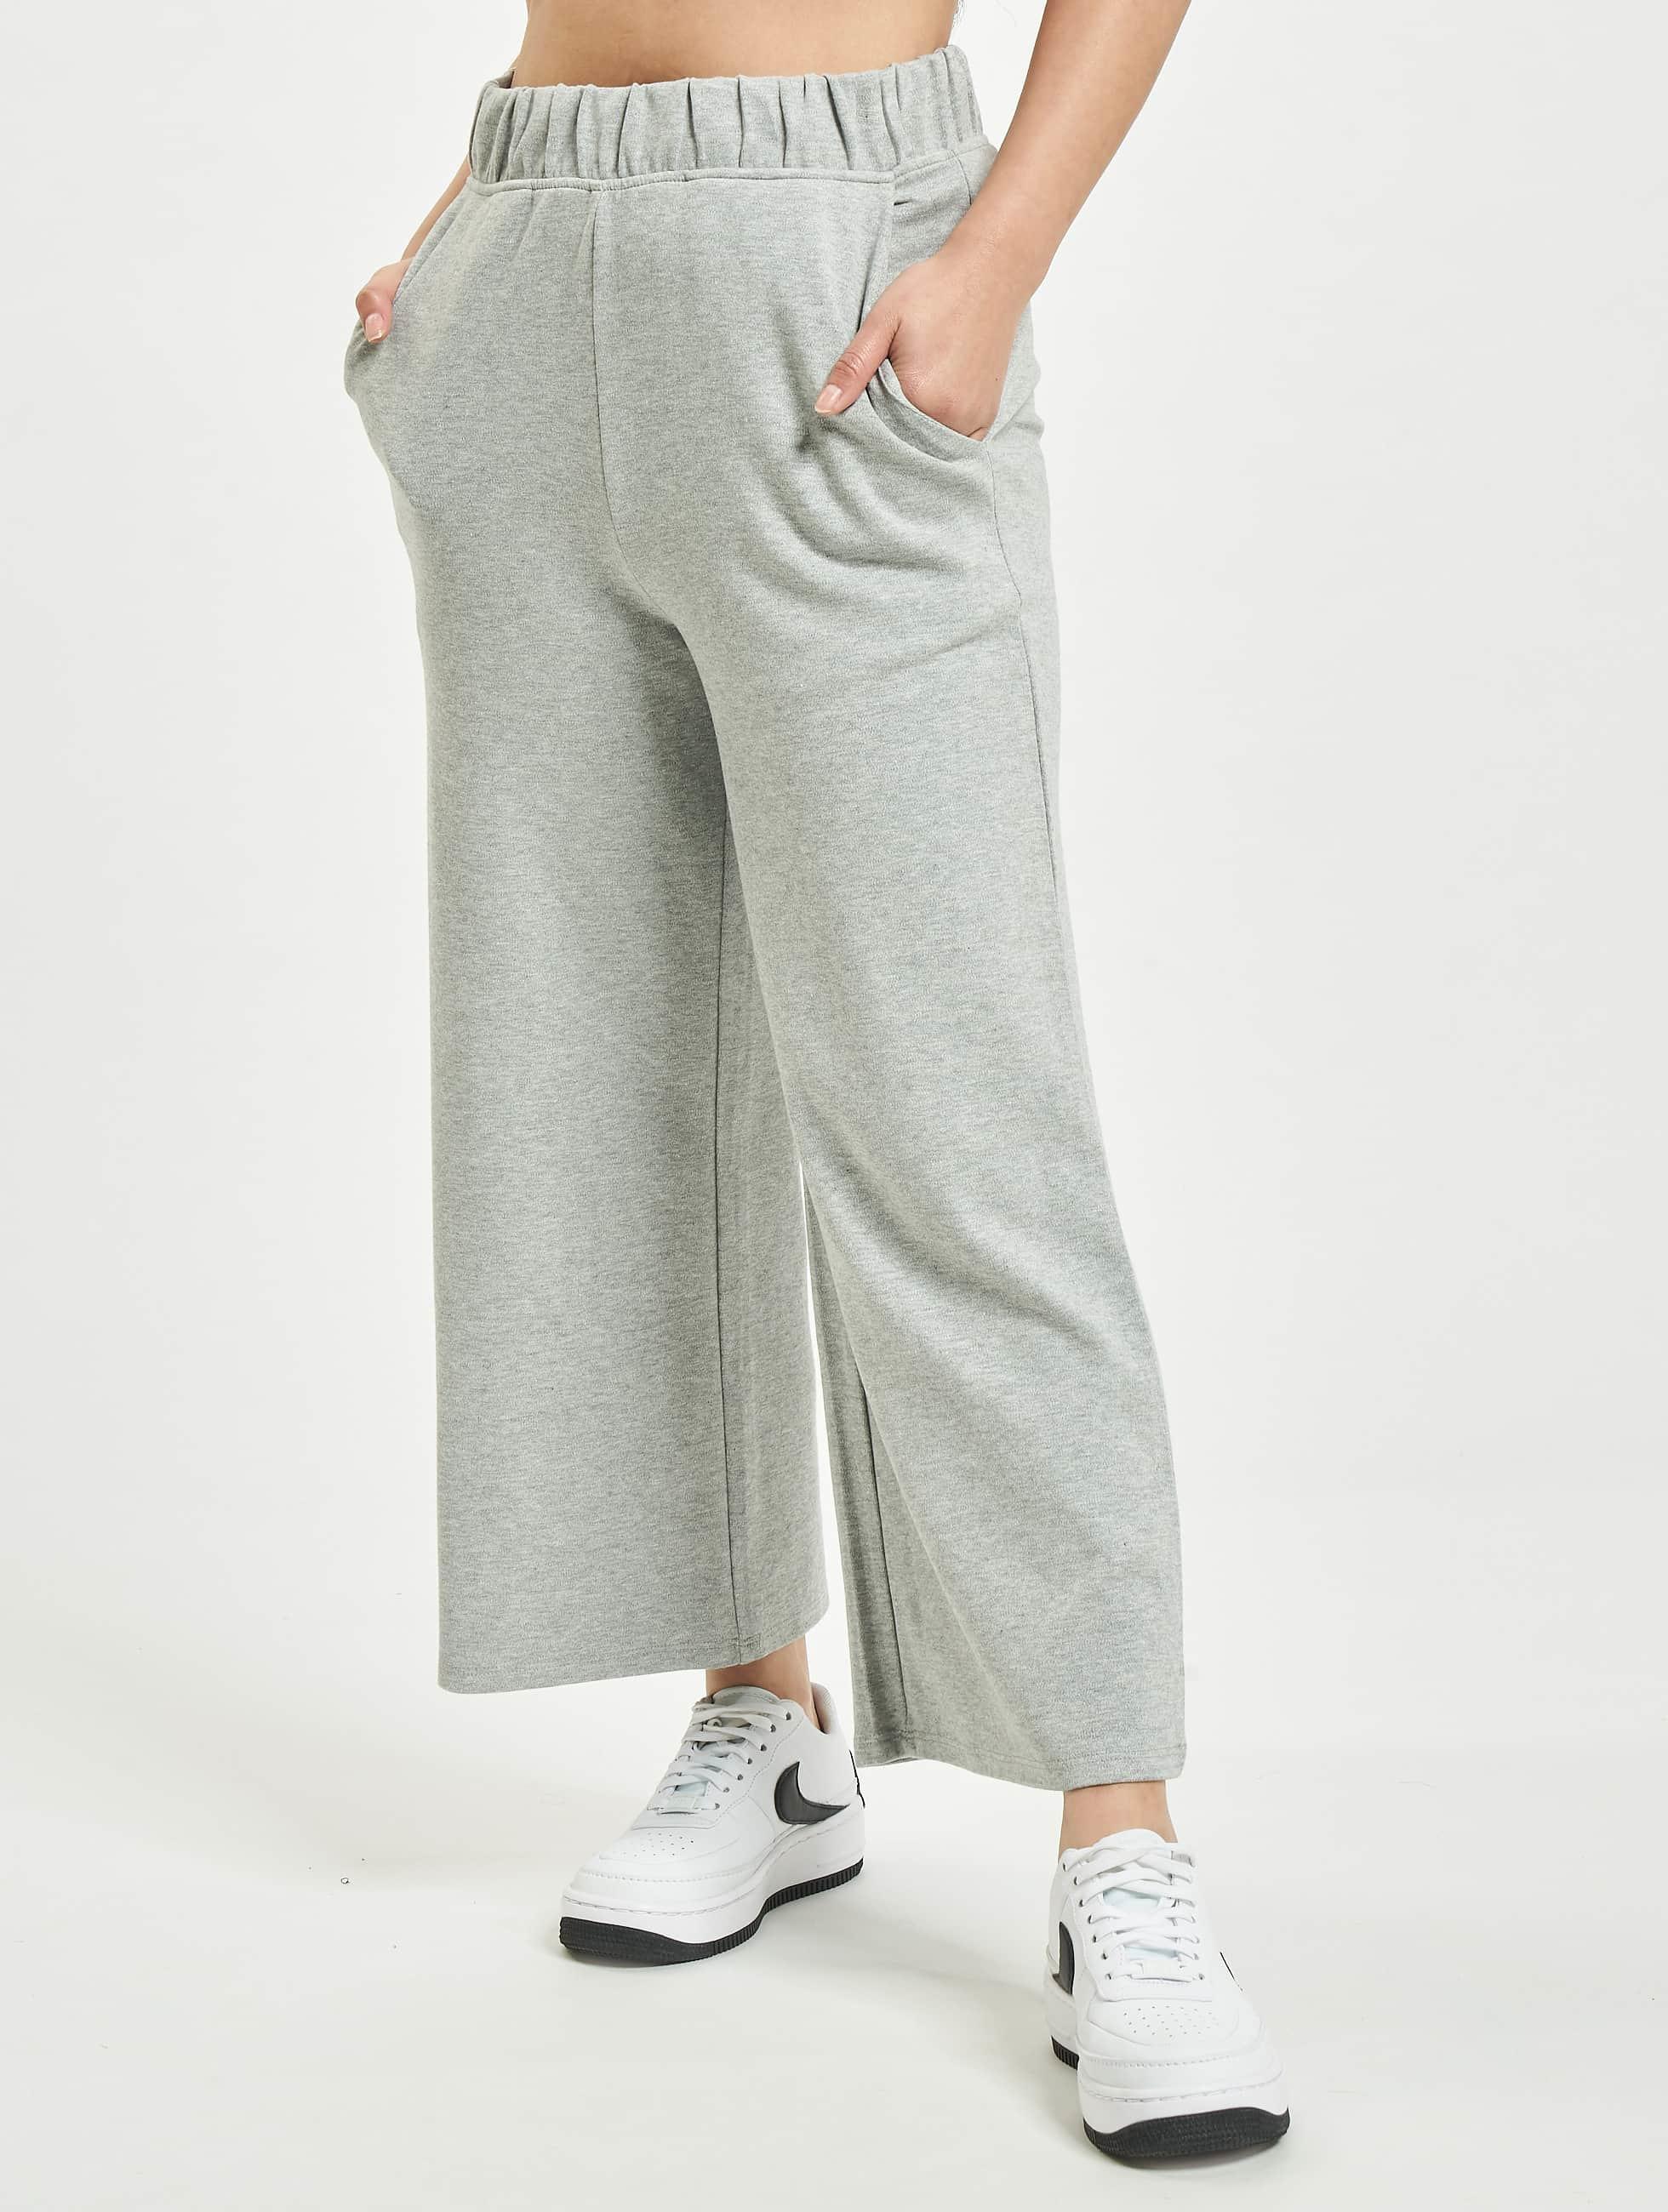 Pantalon professionnel femme en Chino Würth MODYF gris · Urban Classics Pantalon  chino Culotte gris 47ea5782dbc6